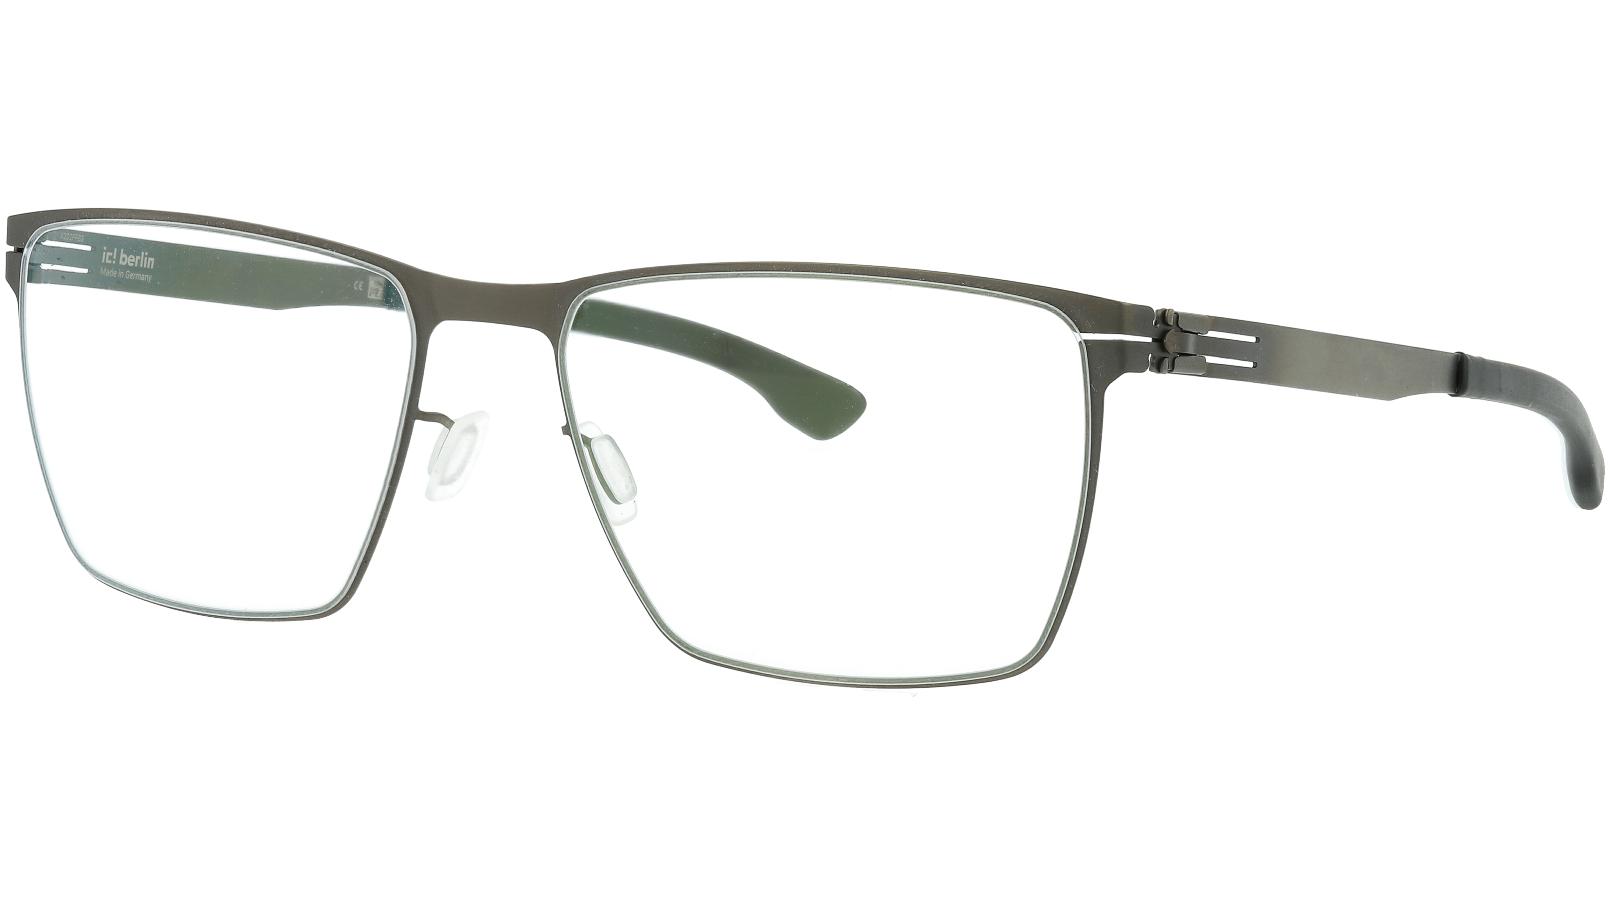 IC BERLIN! Thomas A Graphite Grey and Black Glasses